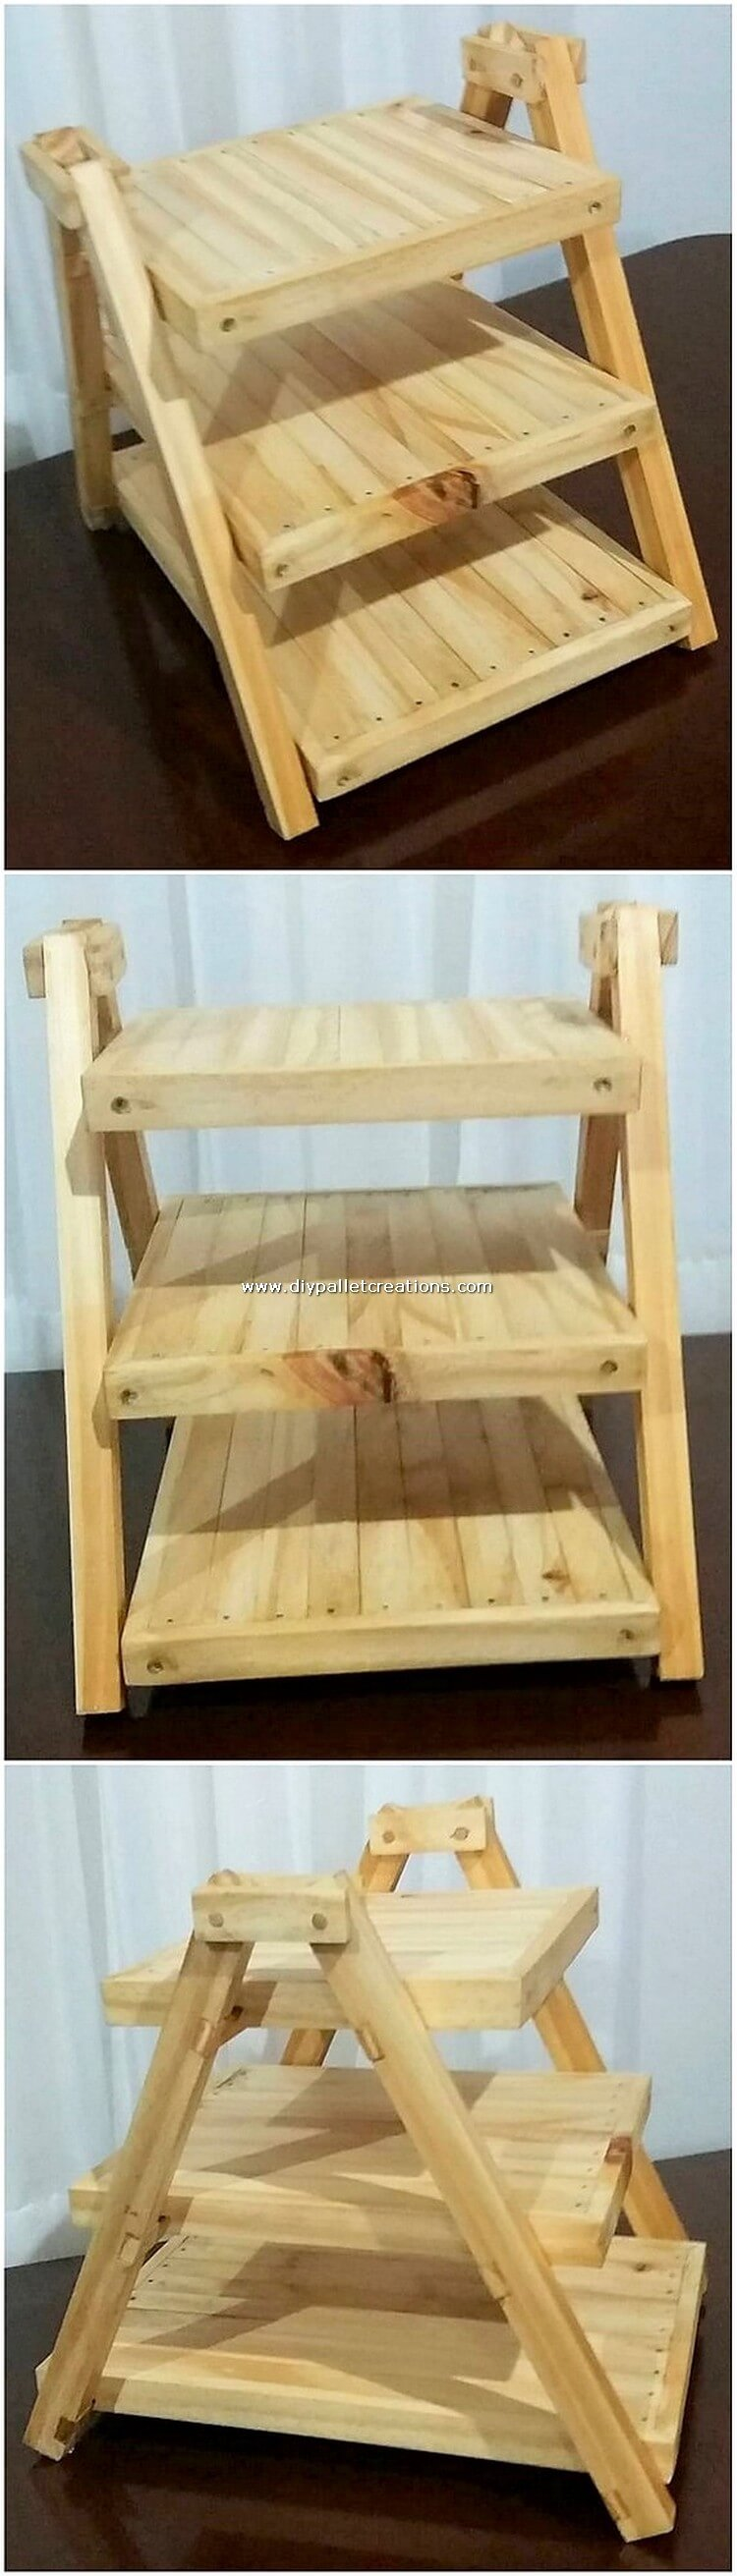 Pallet Mini Shelving Stand